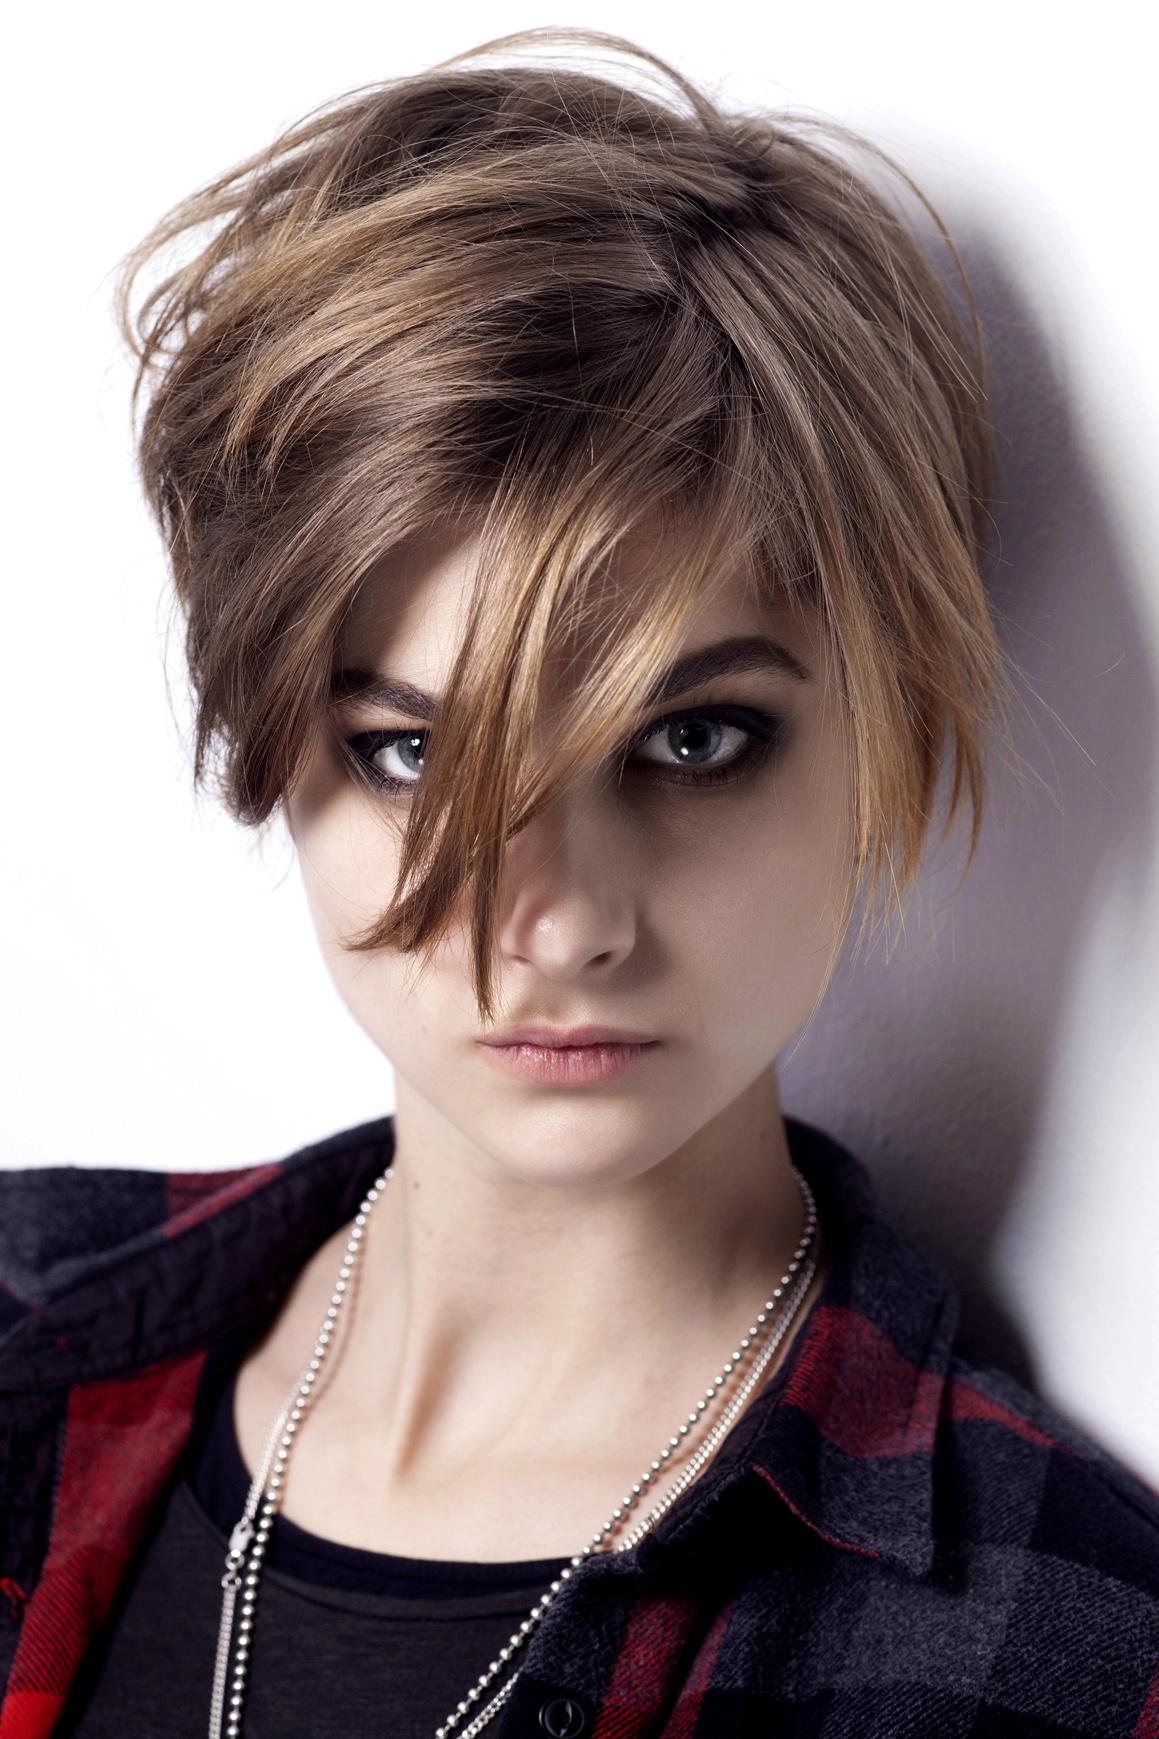 Bad Girl Haircuts : haircuts, Avoid, Haircut:, Expert, StyleCaster